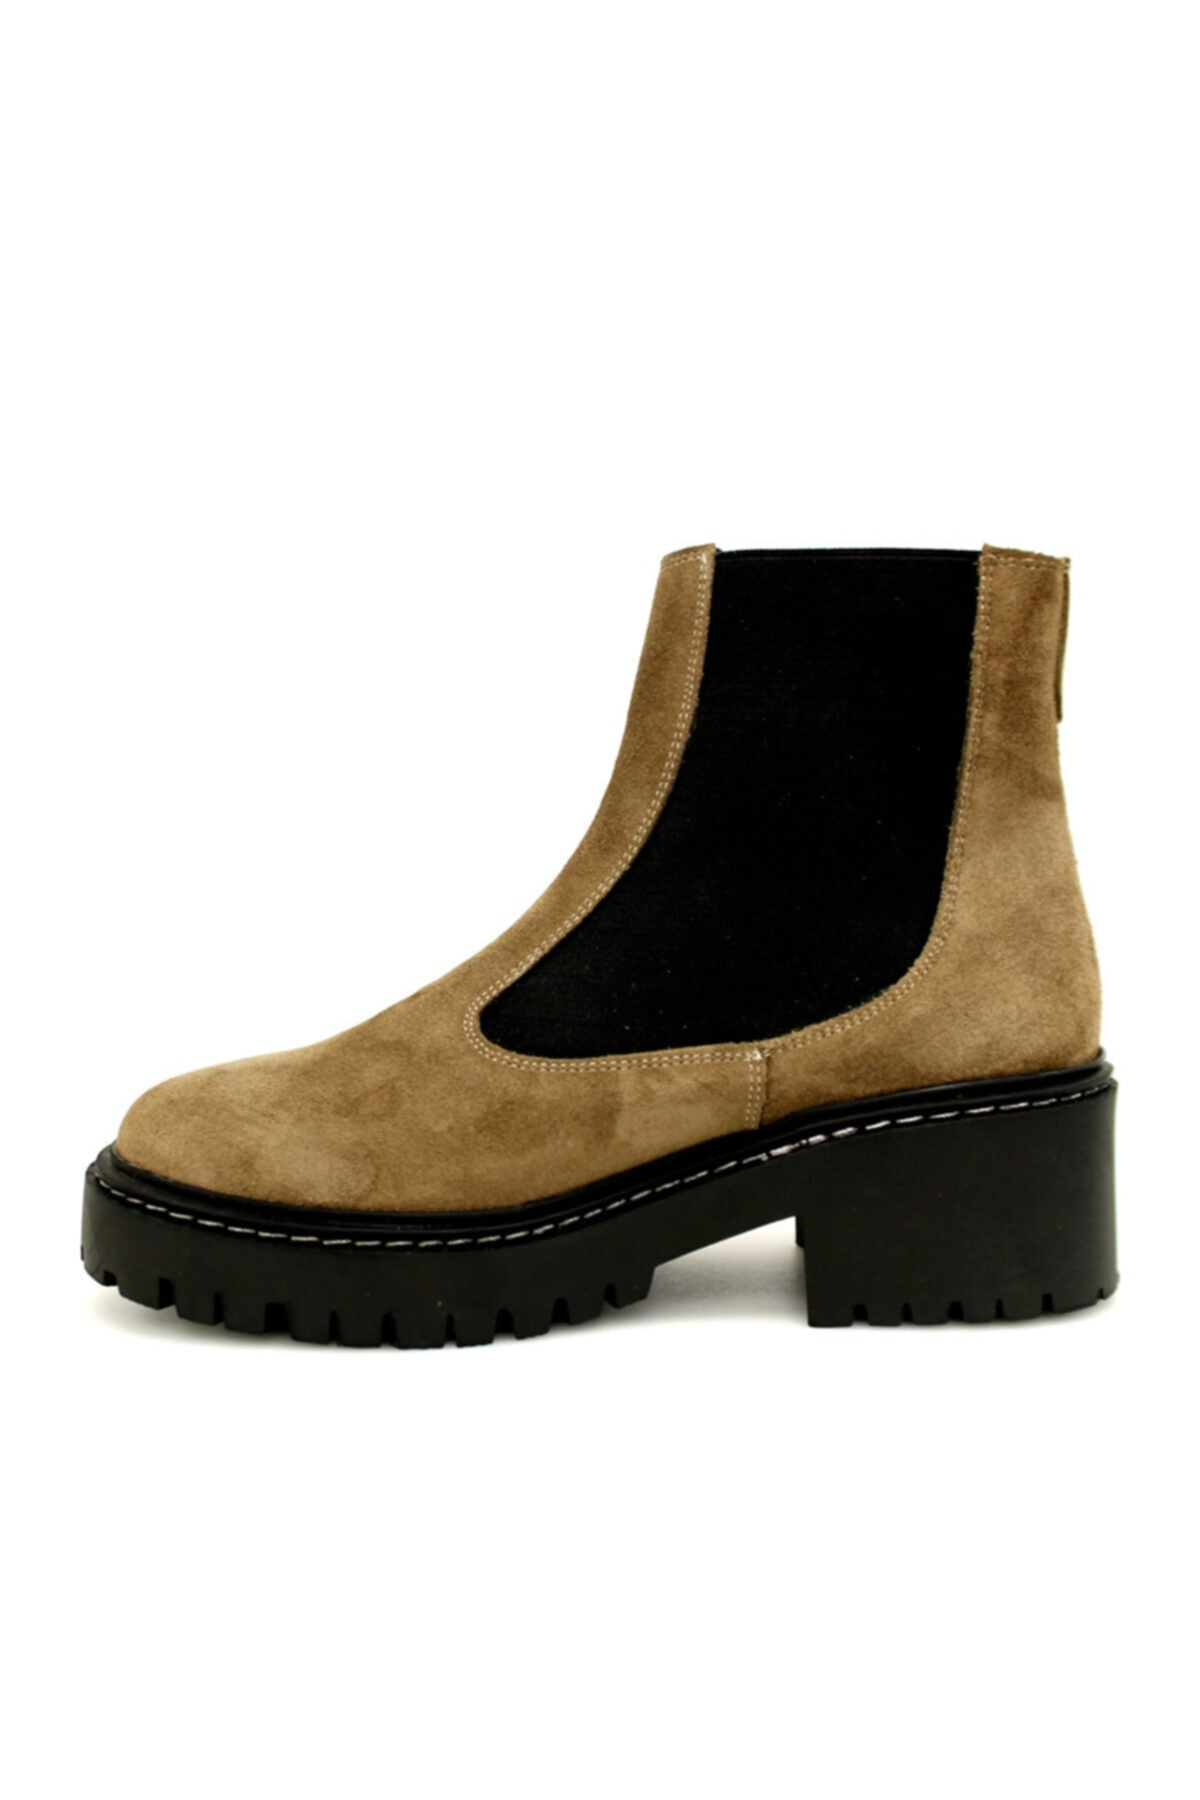 Beta Shoes Kadın Hakiki Deri Bot Süet Vizon 2